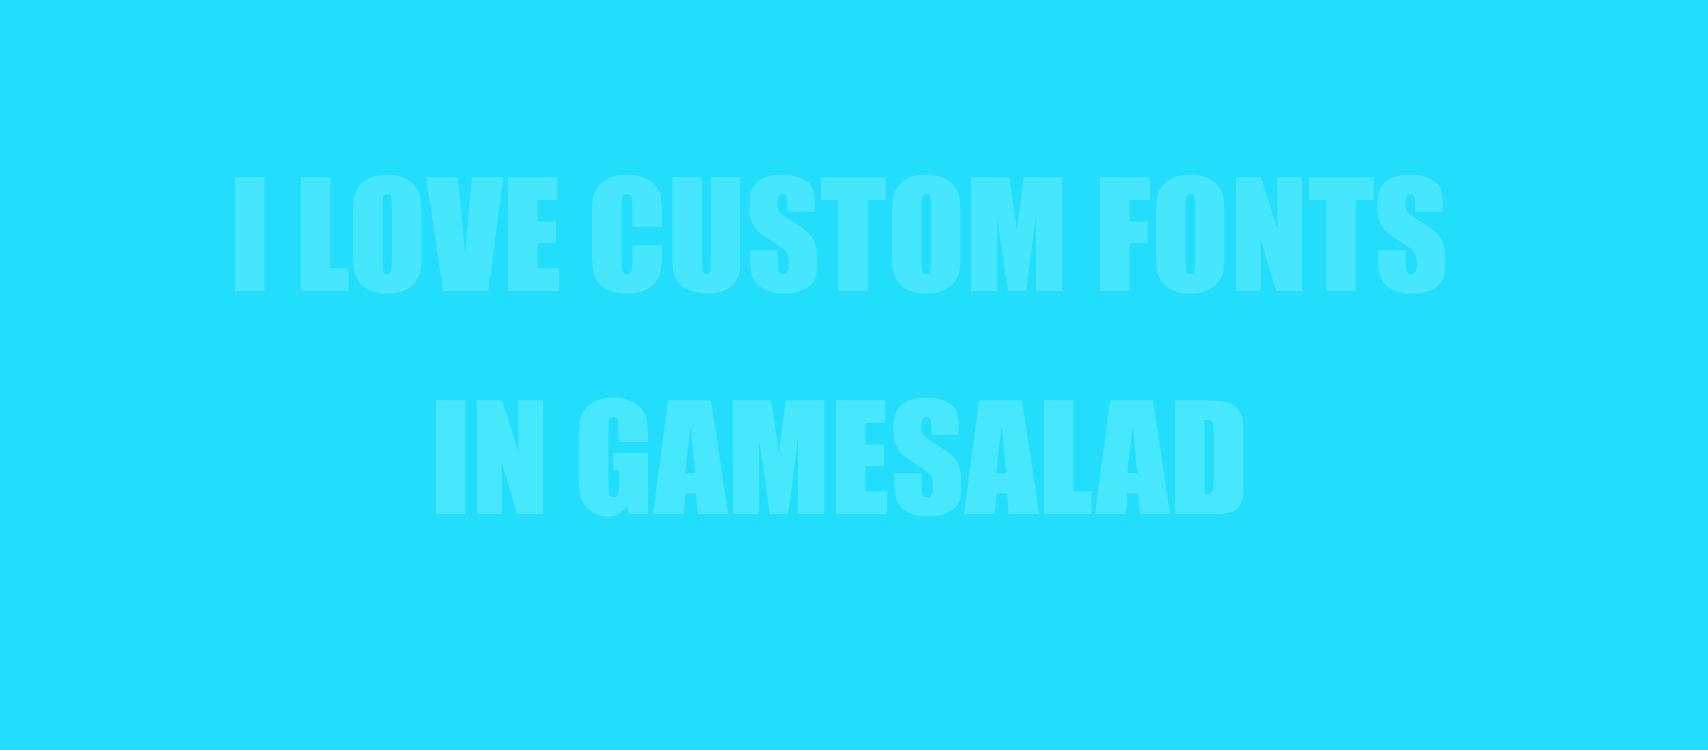 Gamesalad custom fonts - Screen Shot 2016 06 15 At 12 43 43 Pm Png